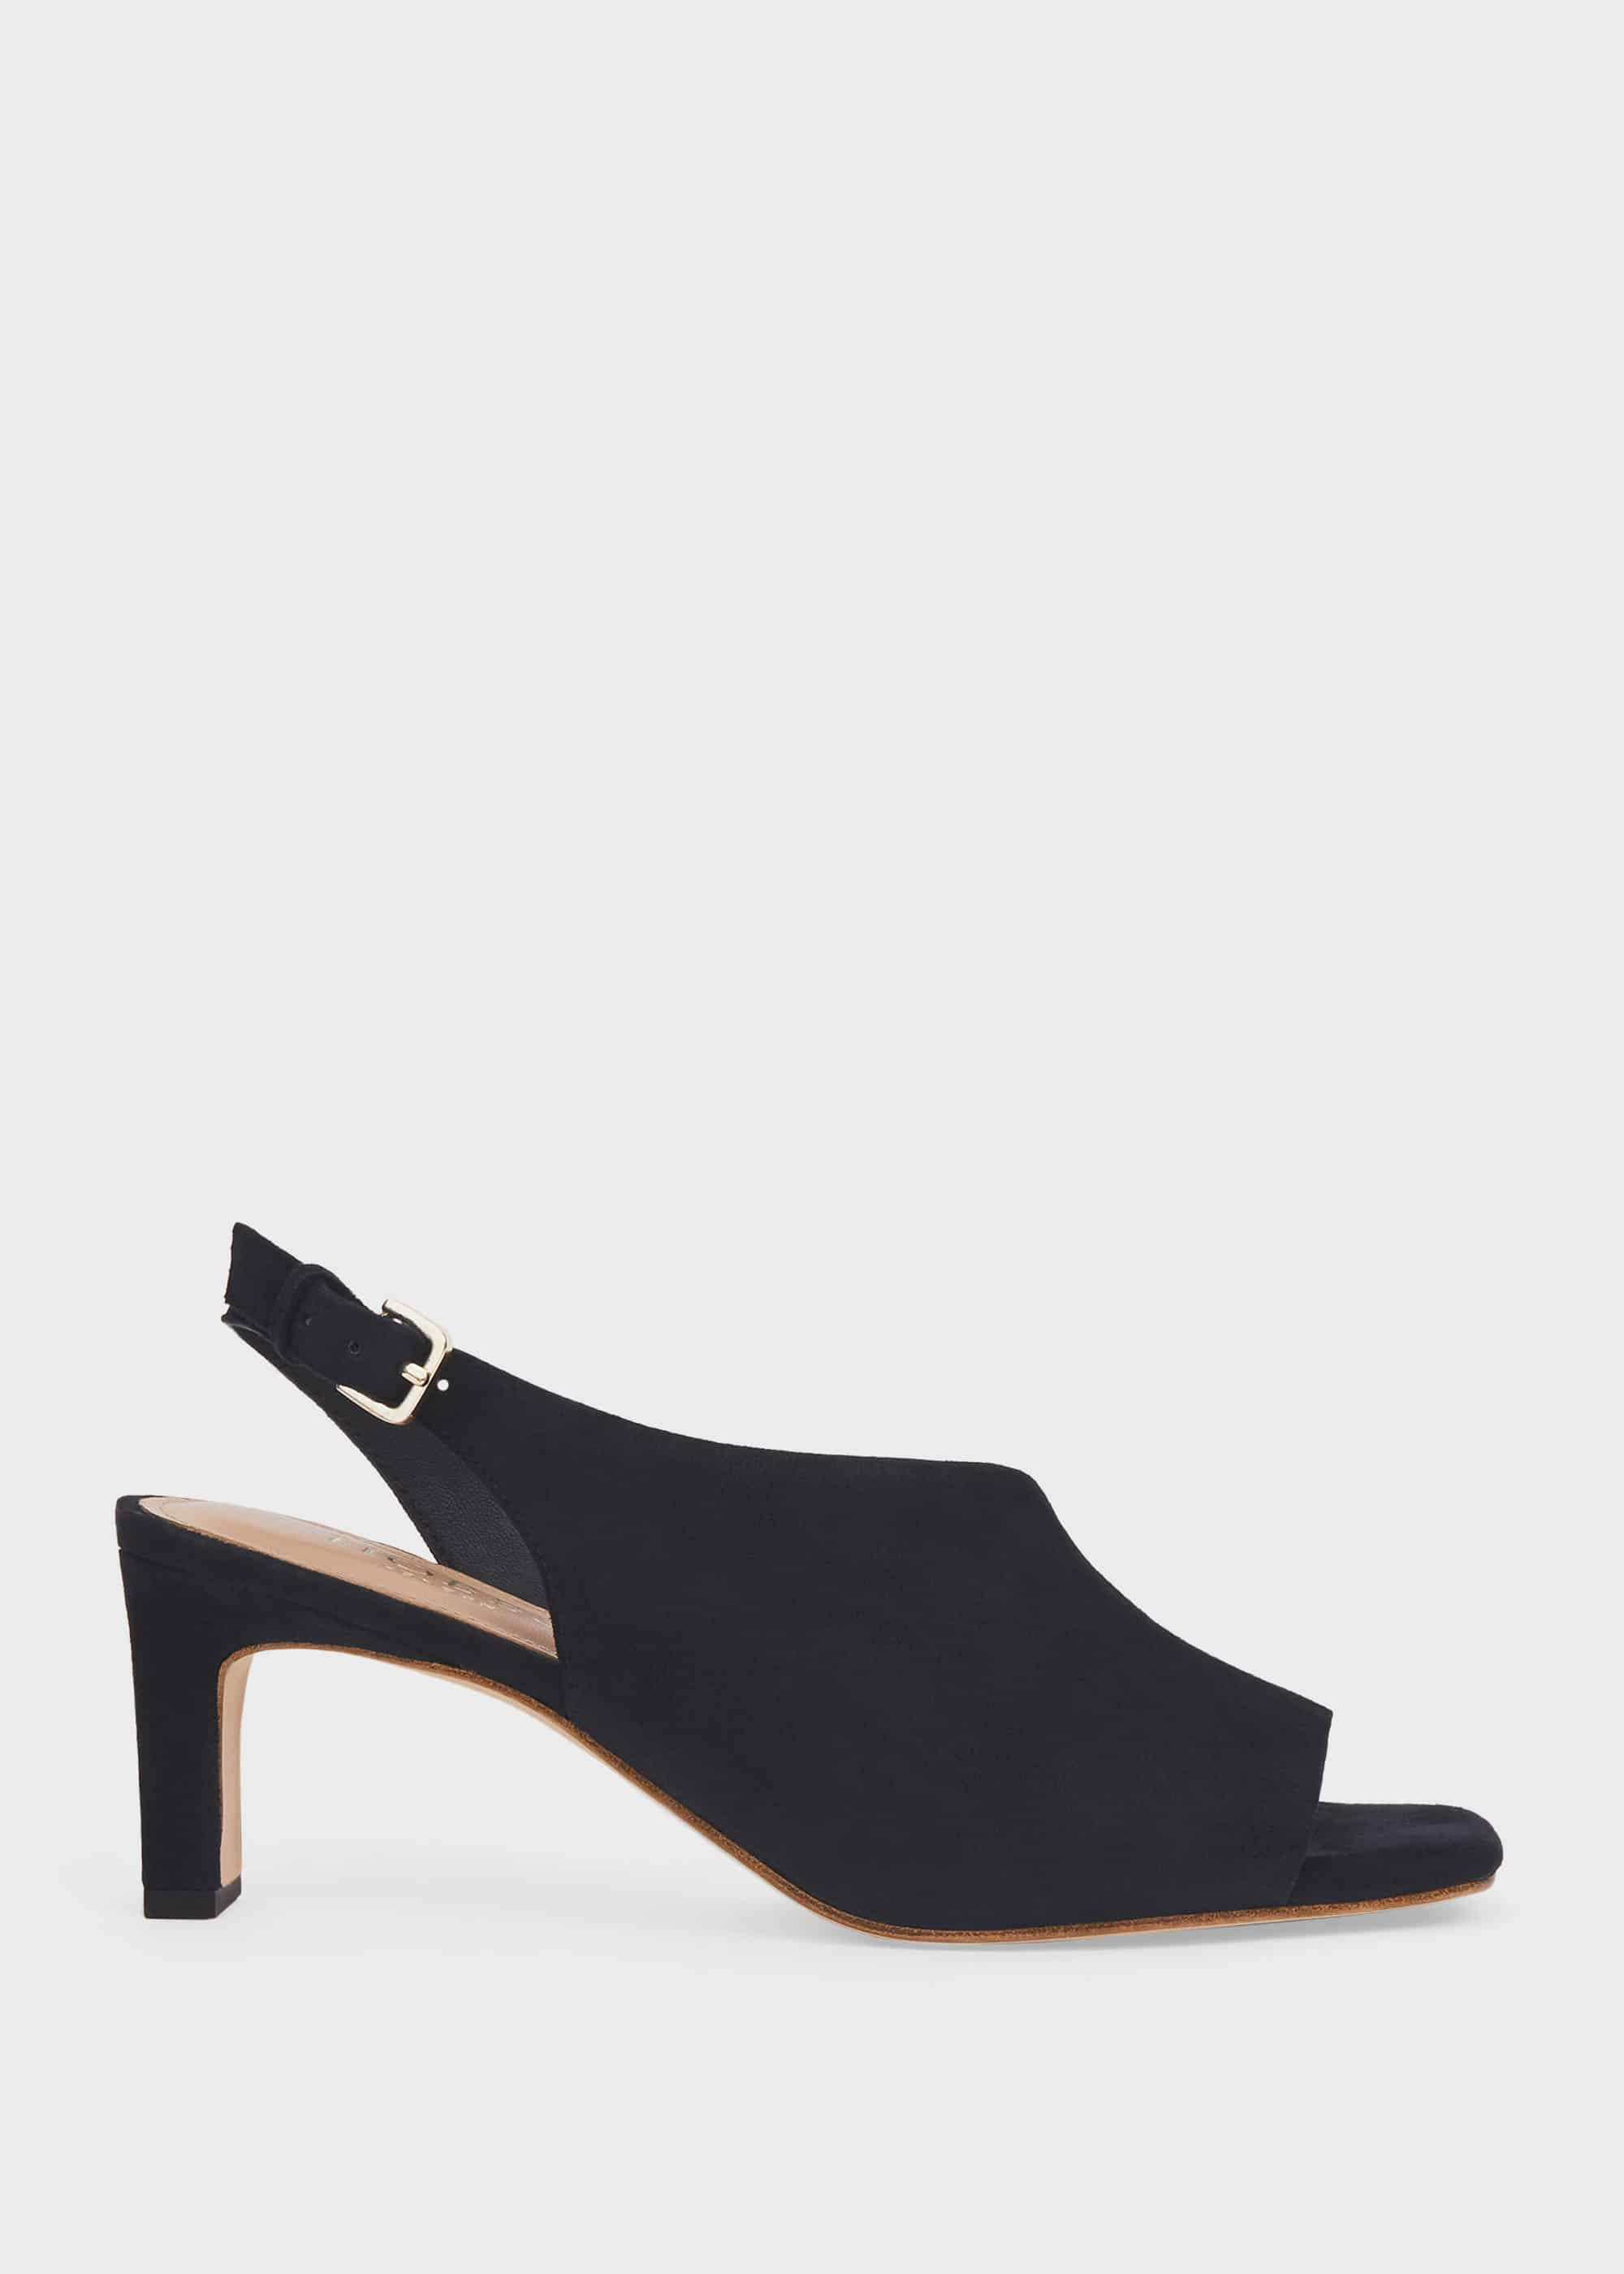 Hobbs Women Kate Suede Sandals